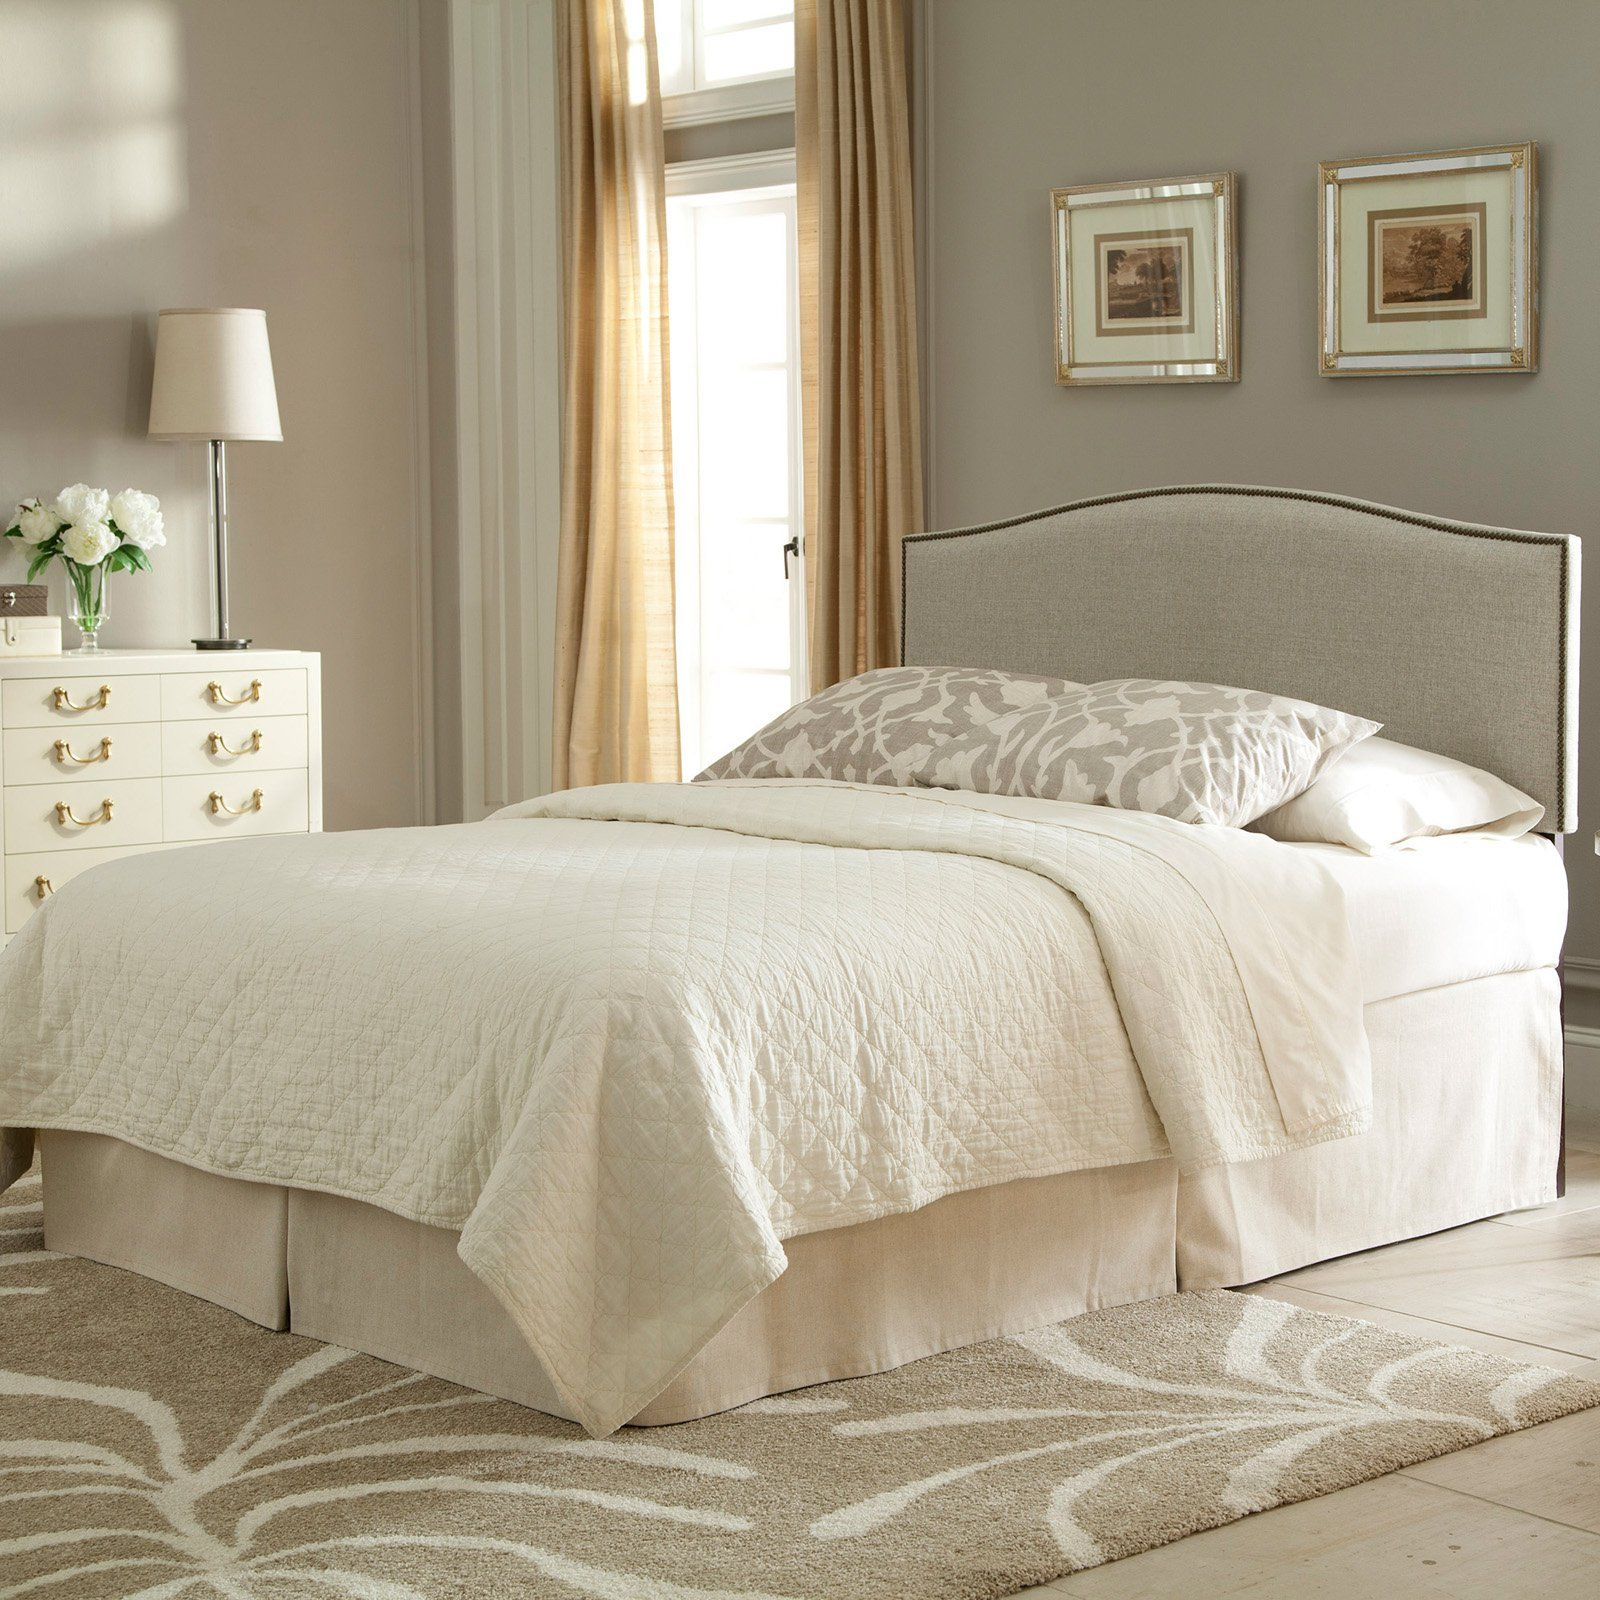 Fashion Bed Group Carlisle Adjustable Height Upholstered